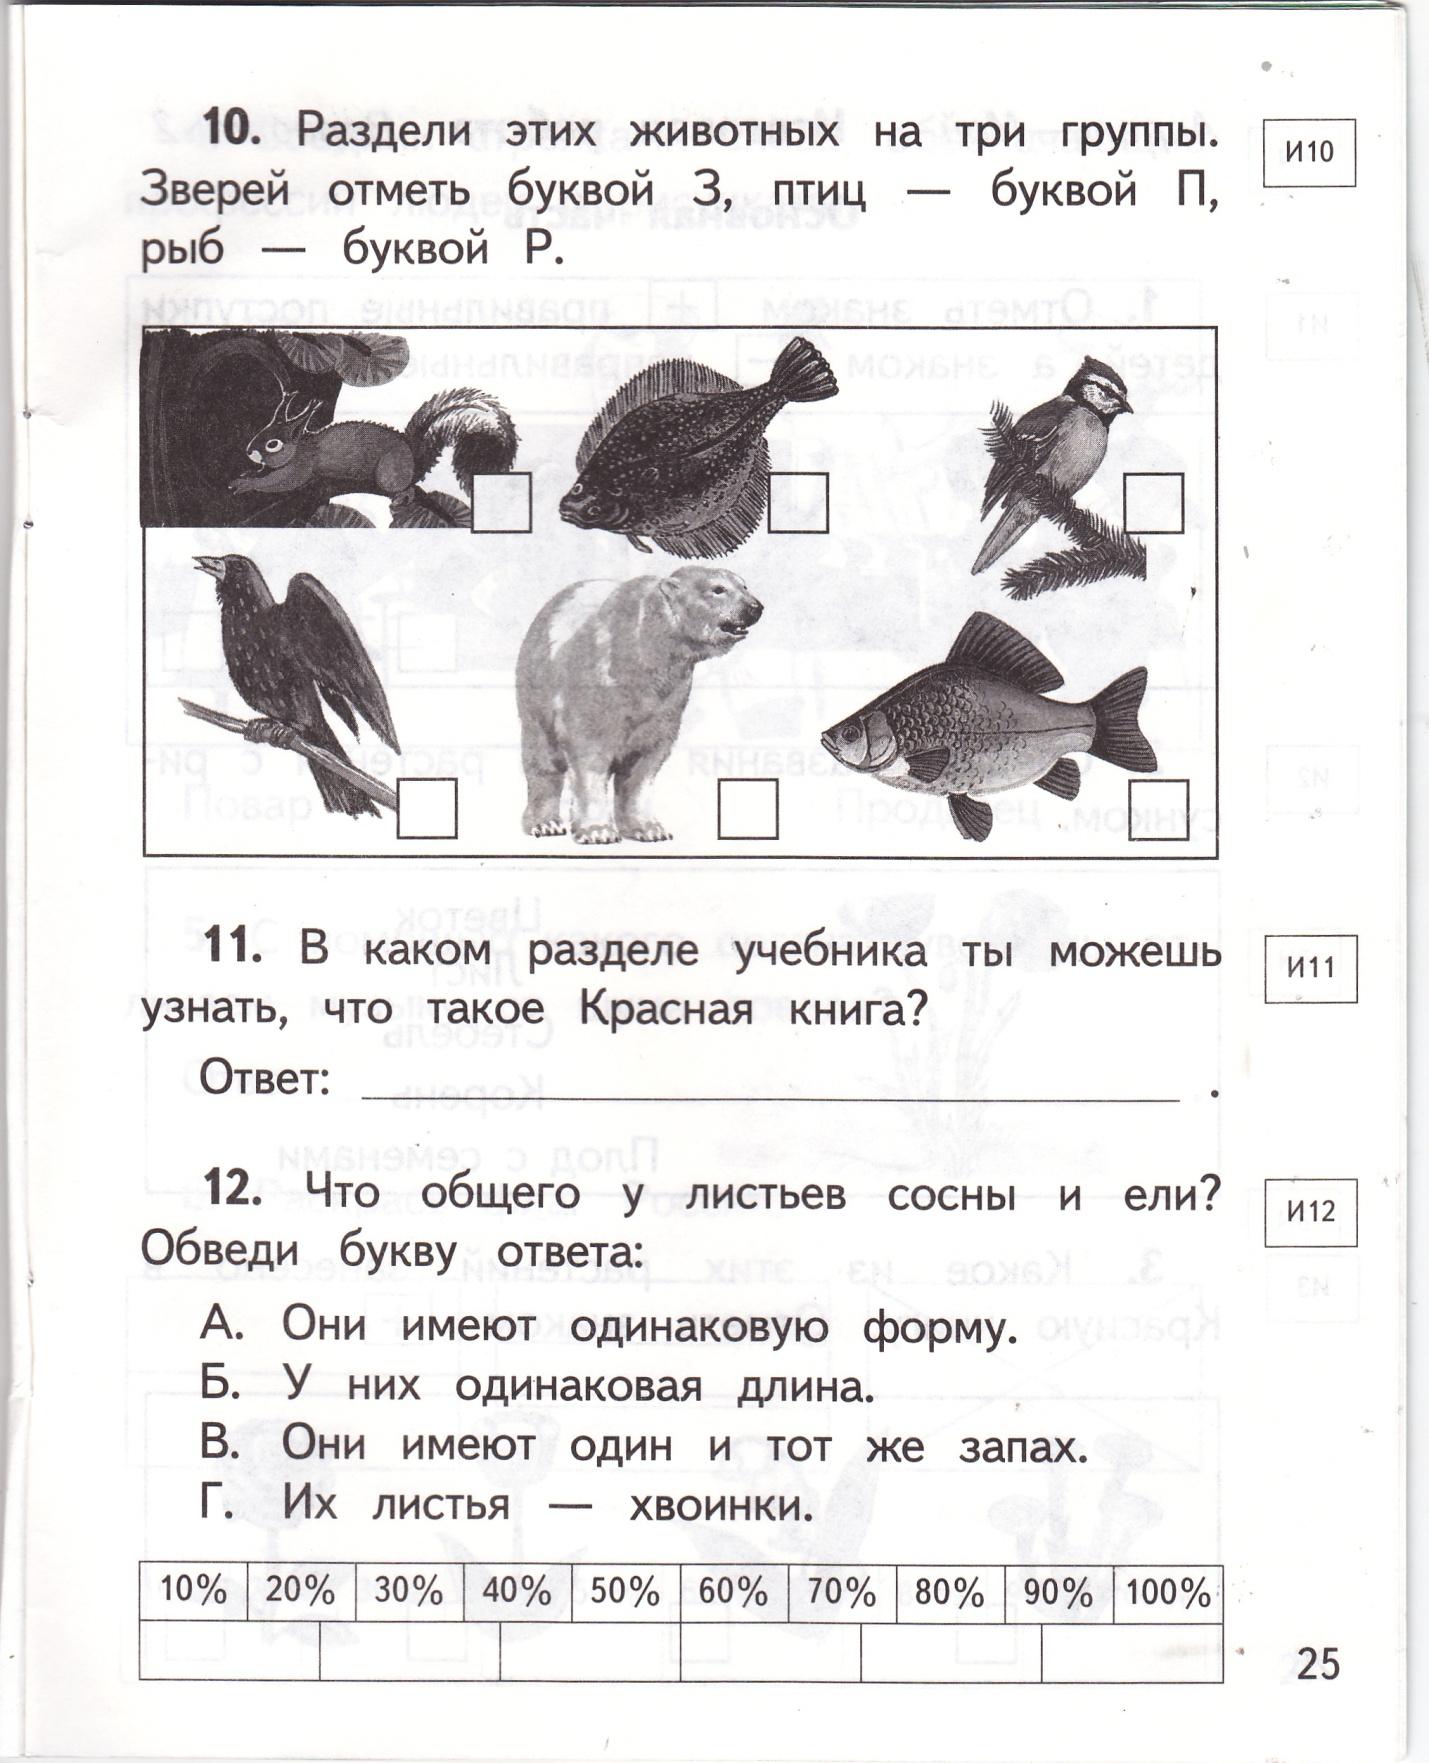 C:\Users\МБОУ СОШ № 4\Desktop\для Жуковой С.Н\IMG_0035.jpg